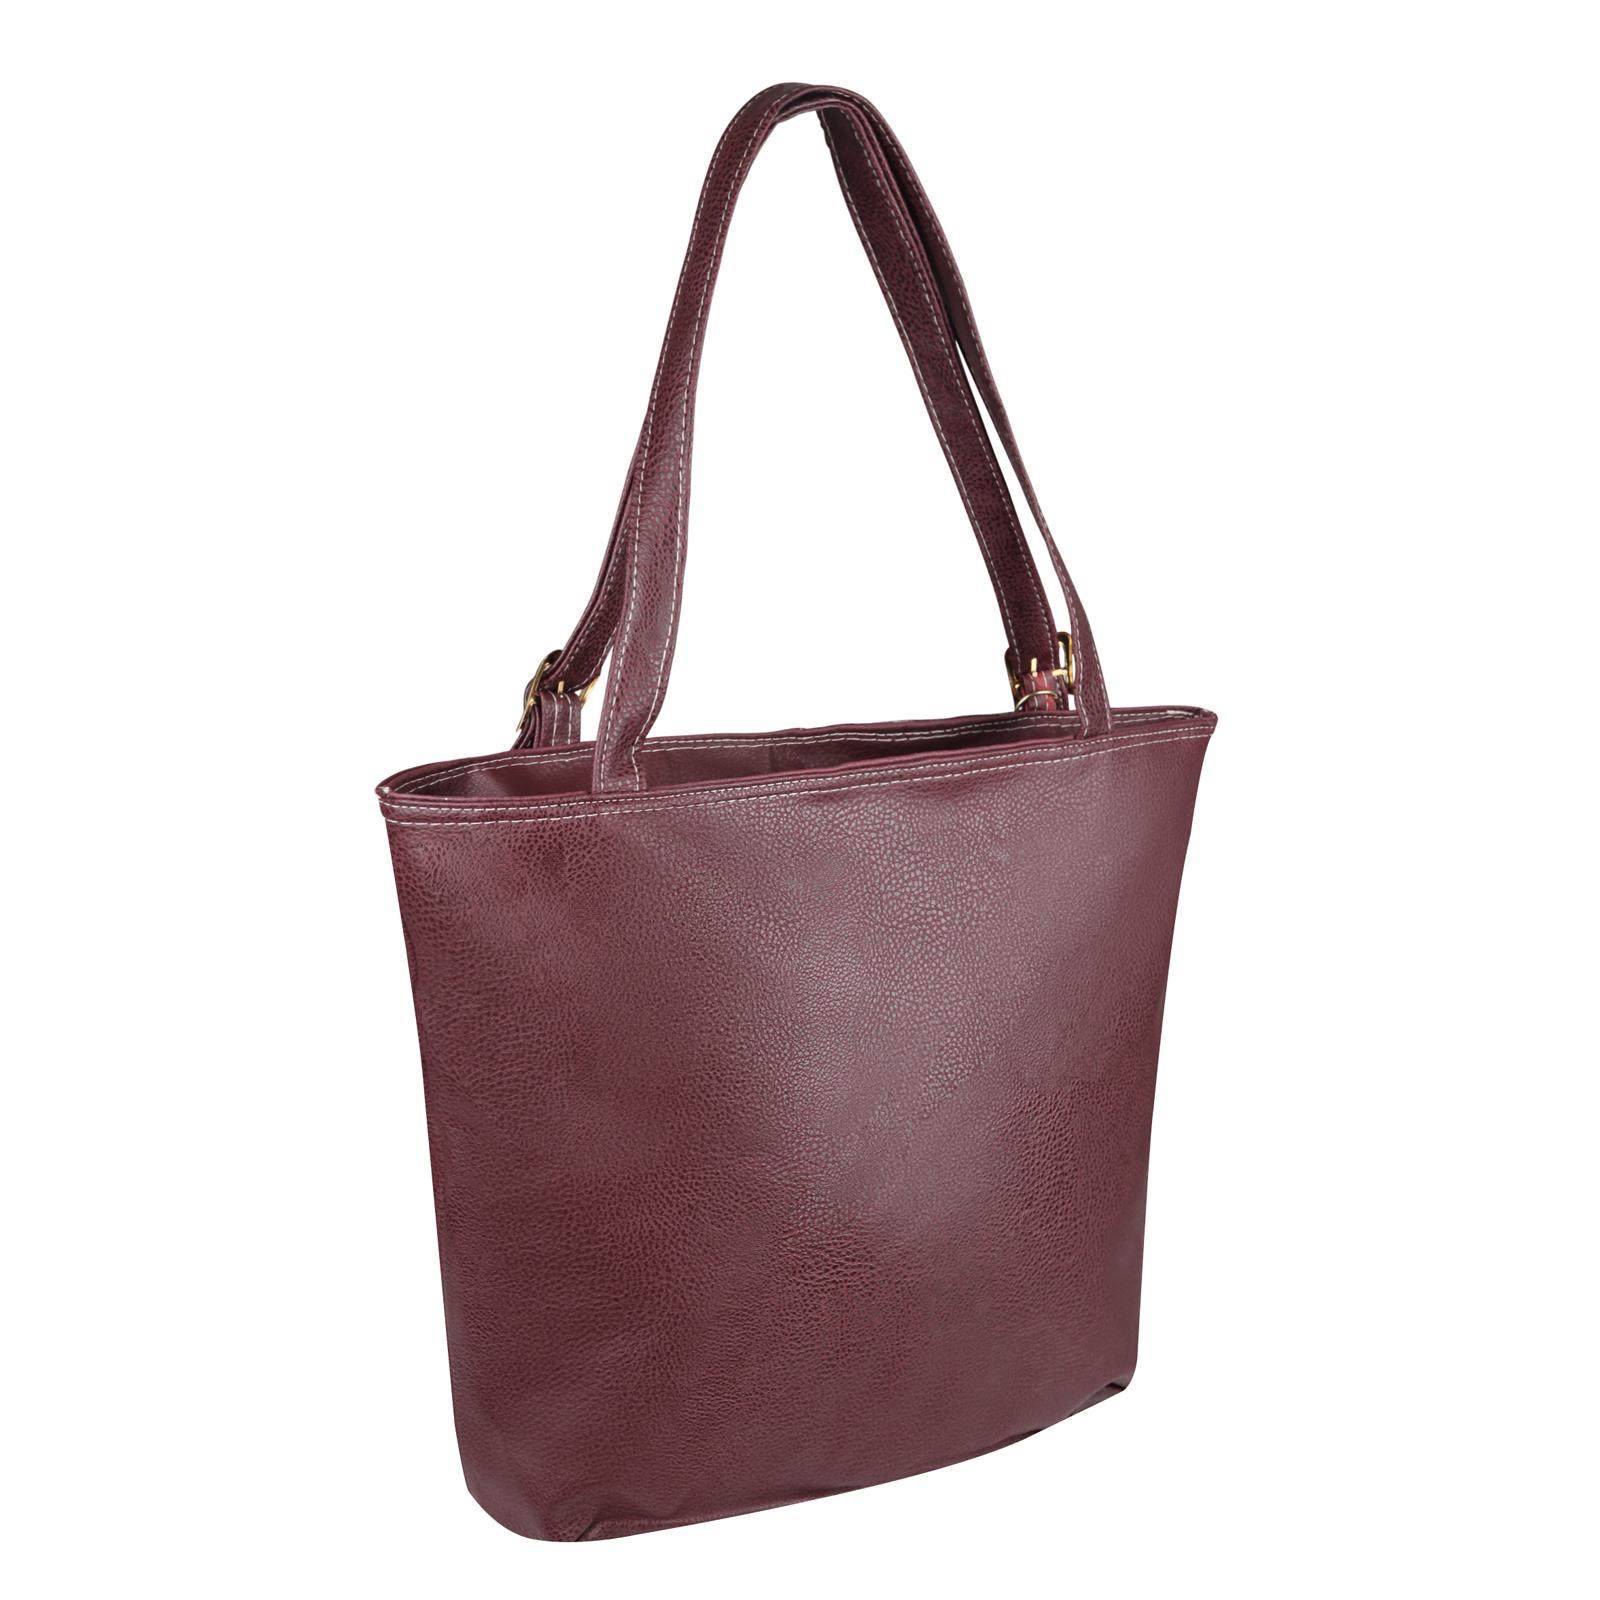 Animal-Print-Handbag-PU-Leather-Shoulder-Bag-Work-Office-Tote-Shopper-Fashion thumbnail 16